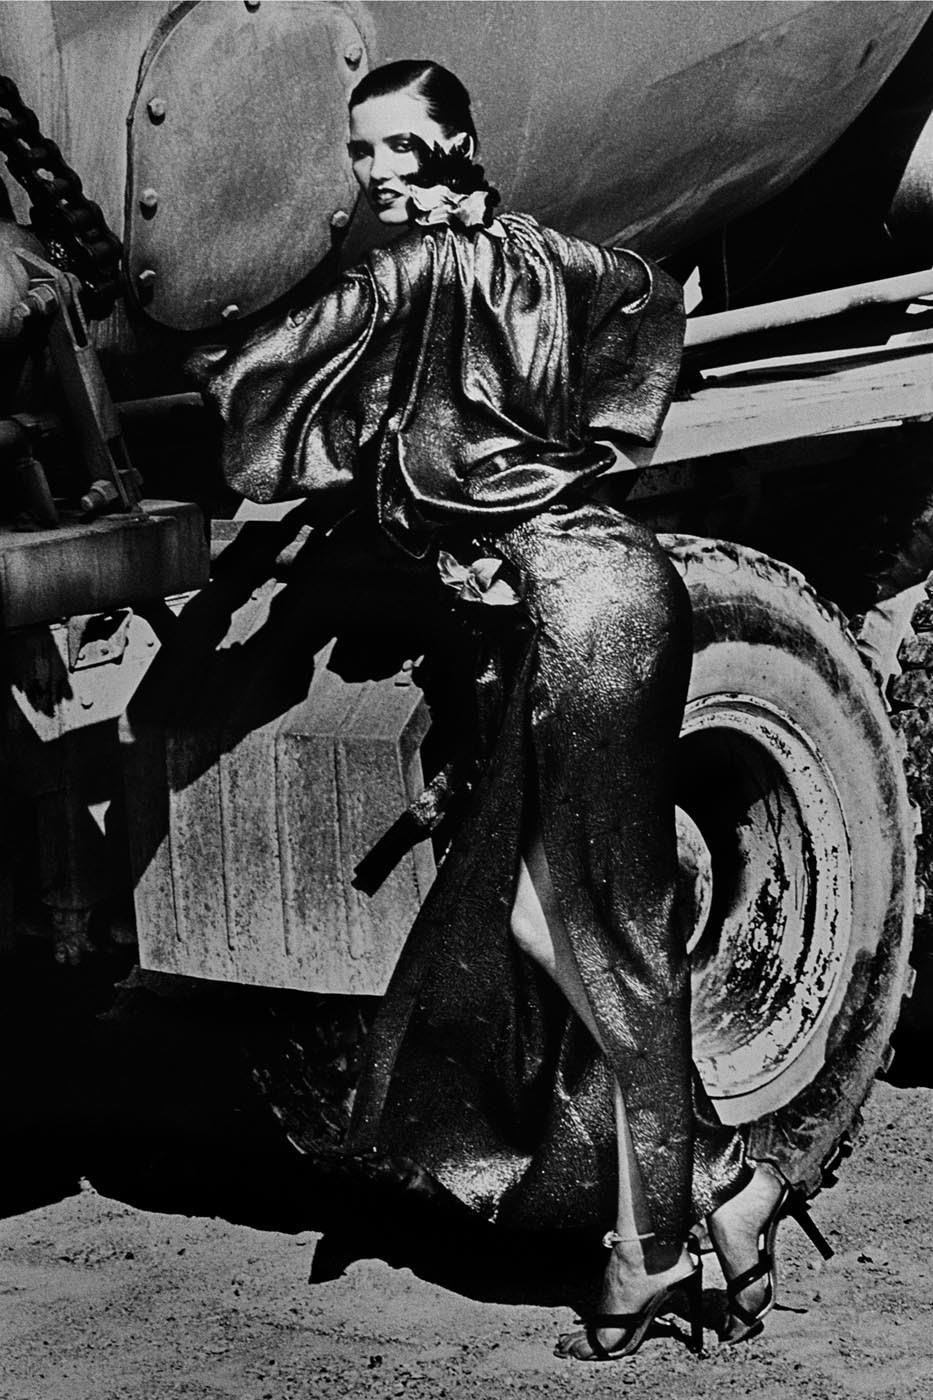 Стоянка грузовиков, 1985. Фотограф Хельмут Ньютон